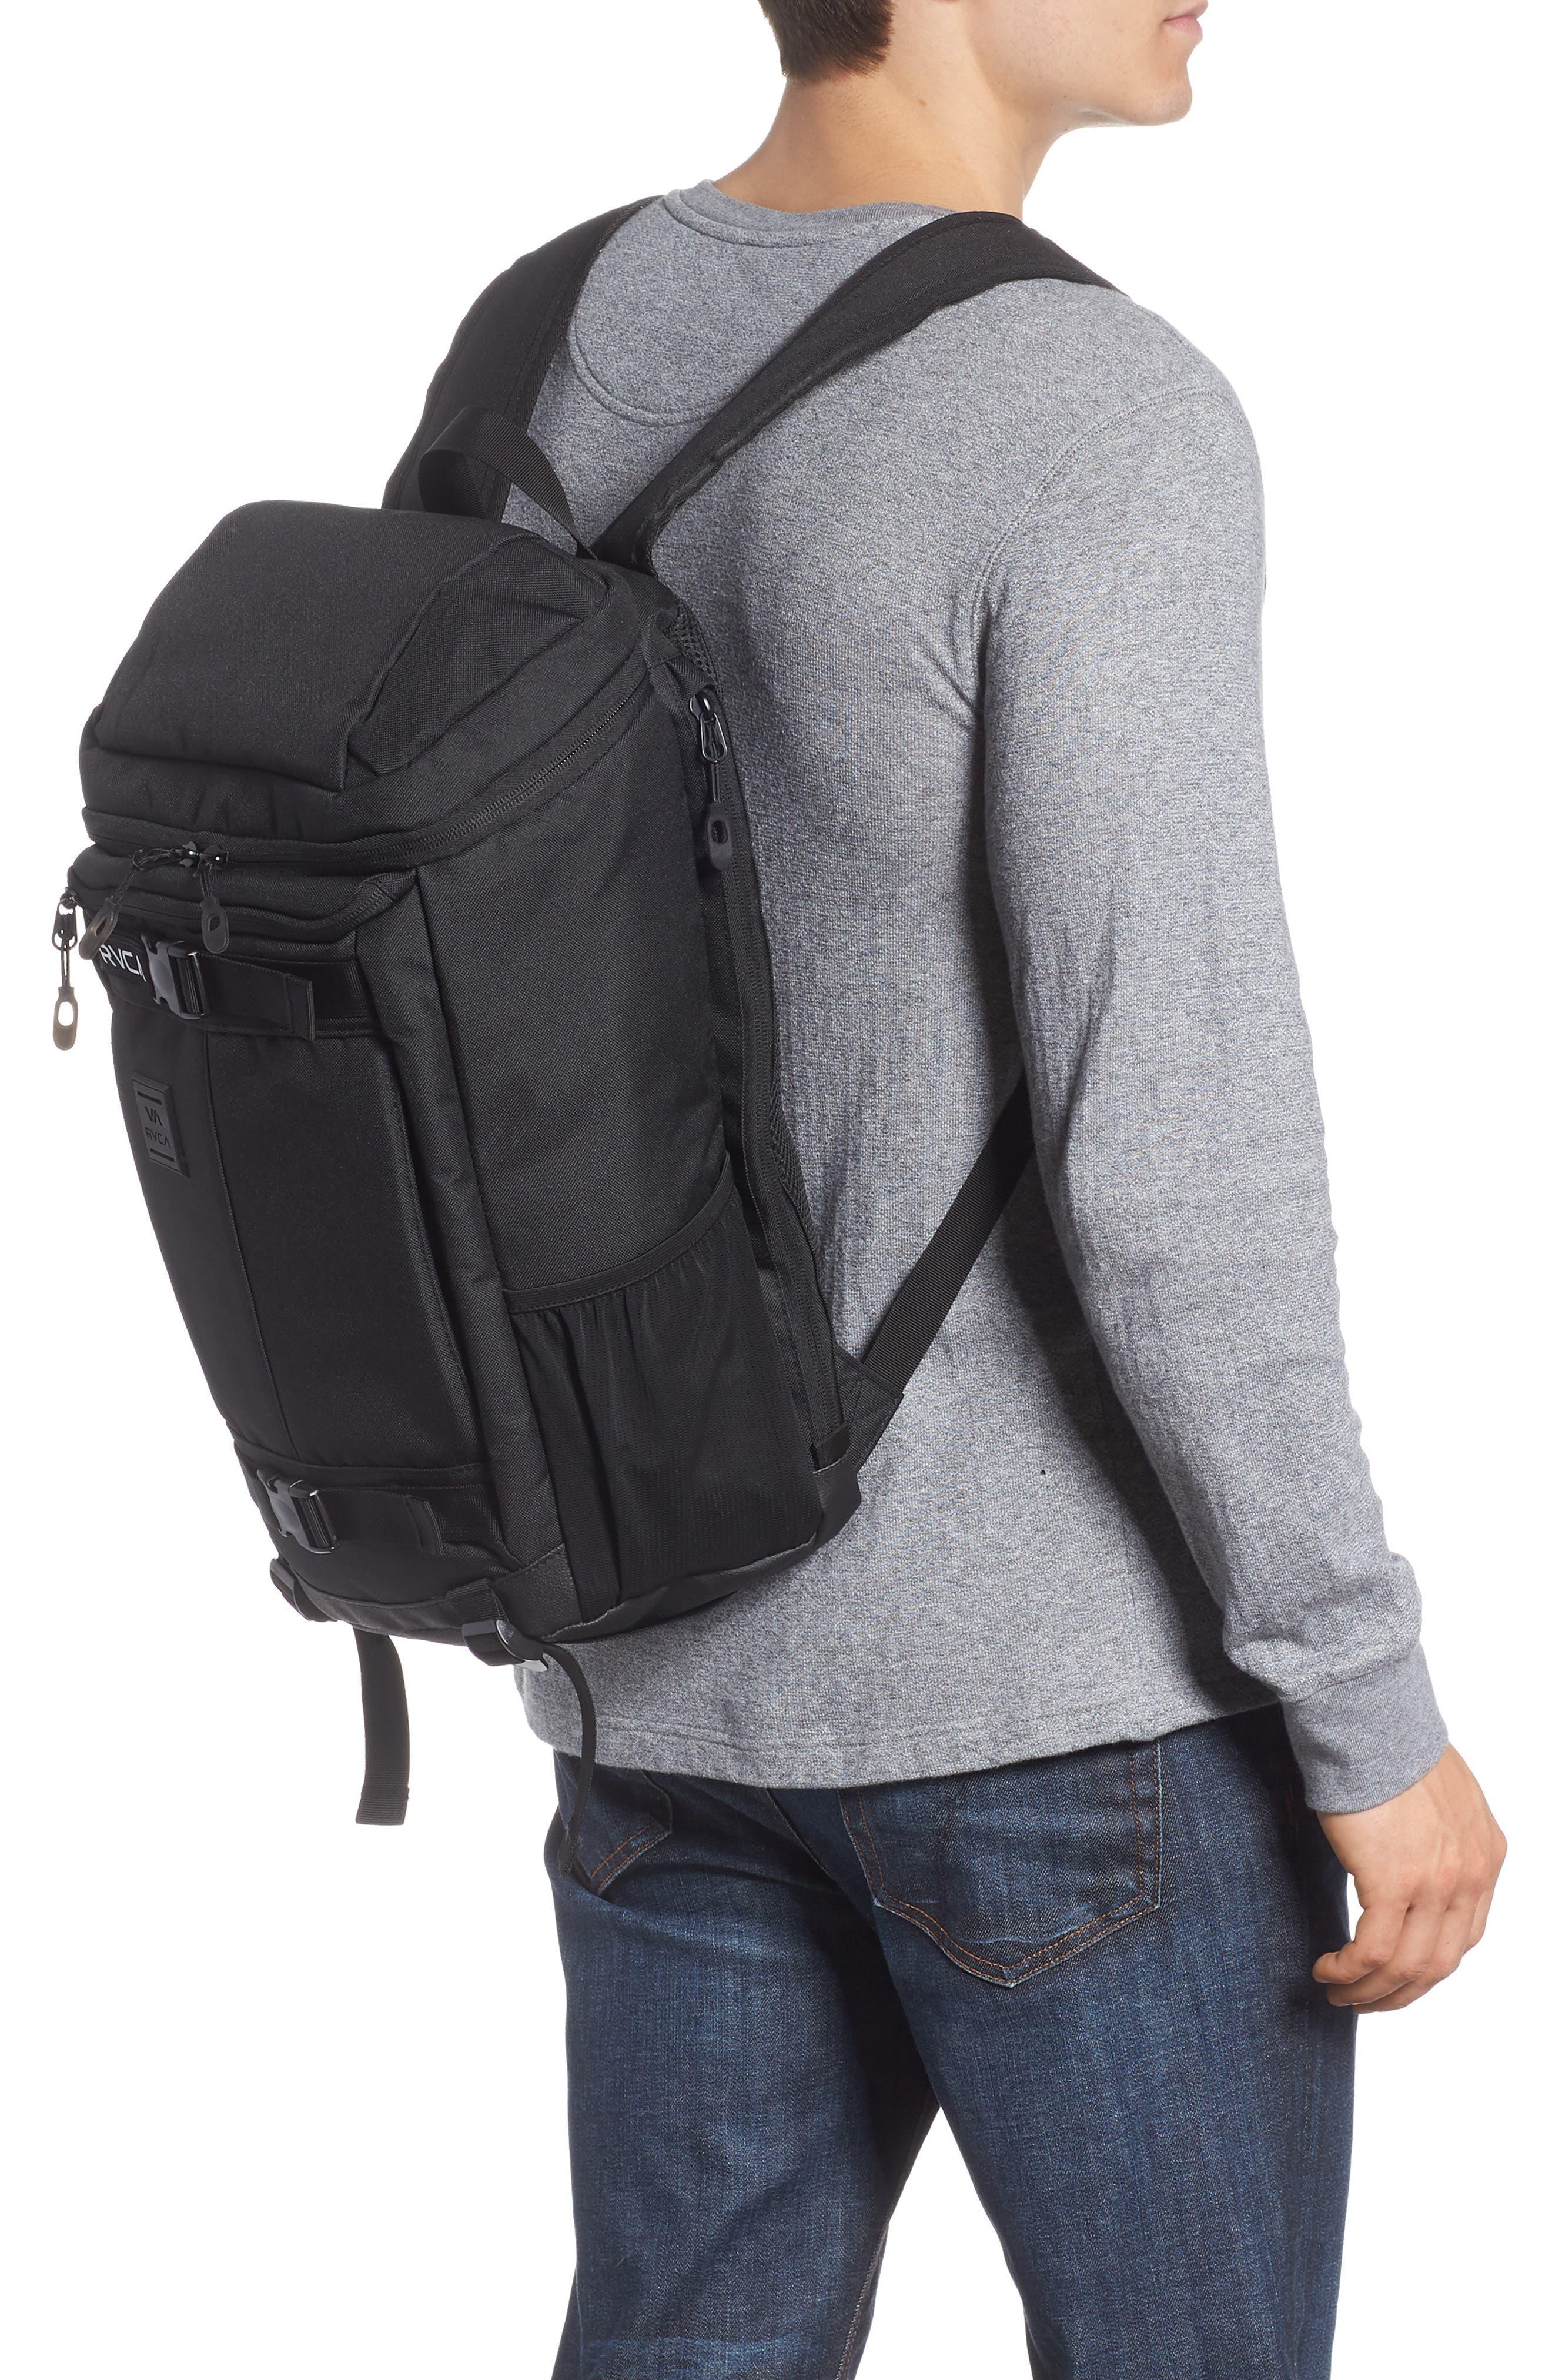 Voyage Skate Commuter Backpack,                             Alternate thumbnail 2, color,                             001